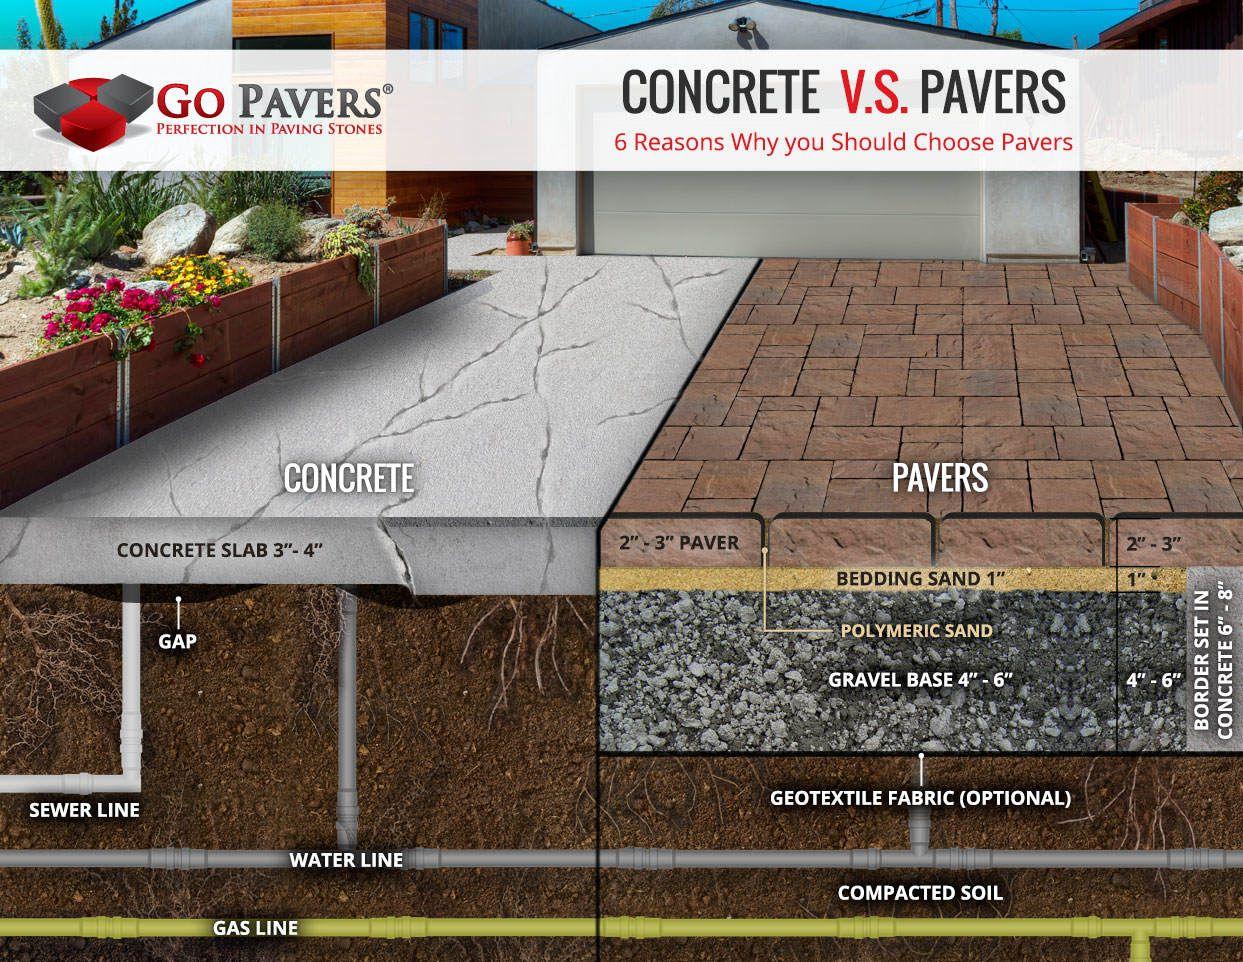 Easily compare the advantages disadvantages of pavers vs